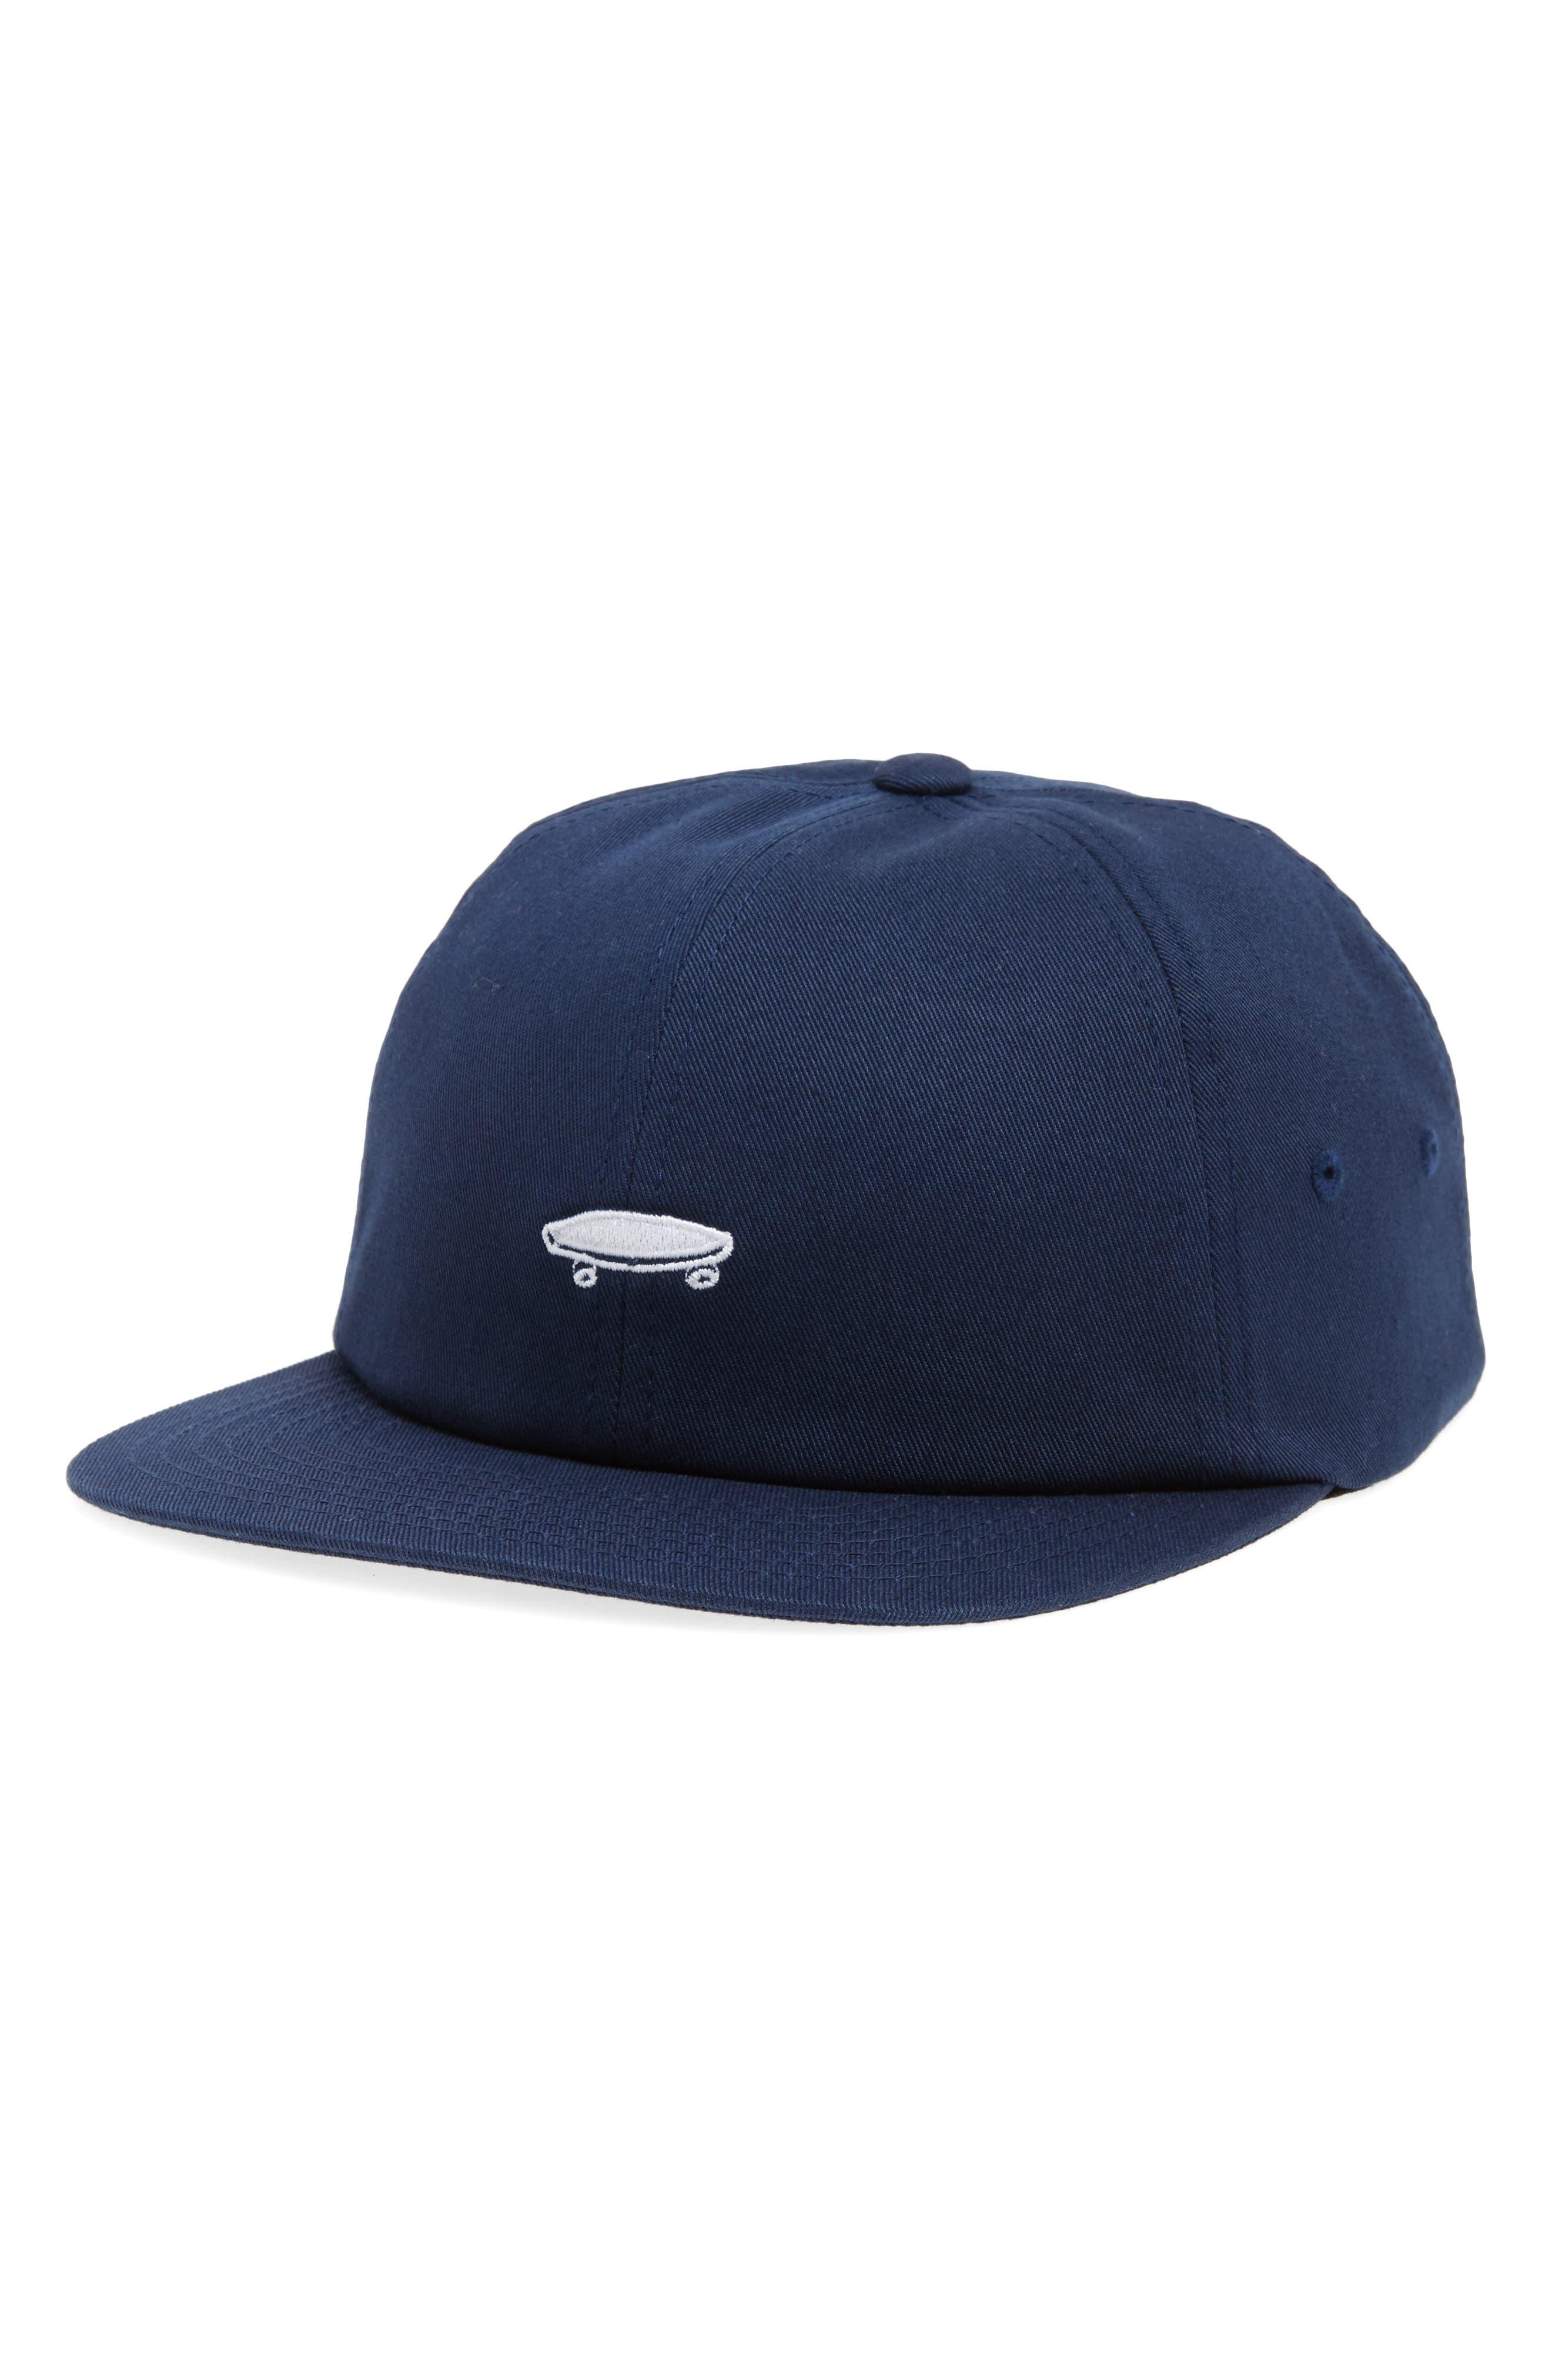 Vans Salton II Ball Cap